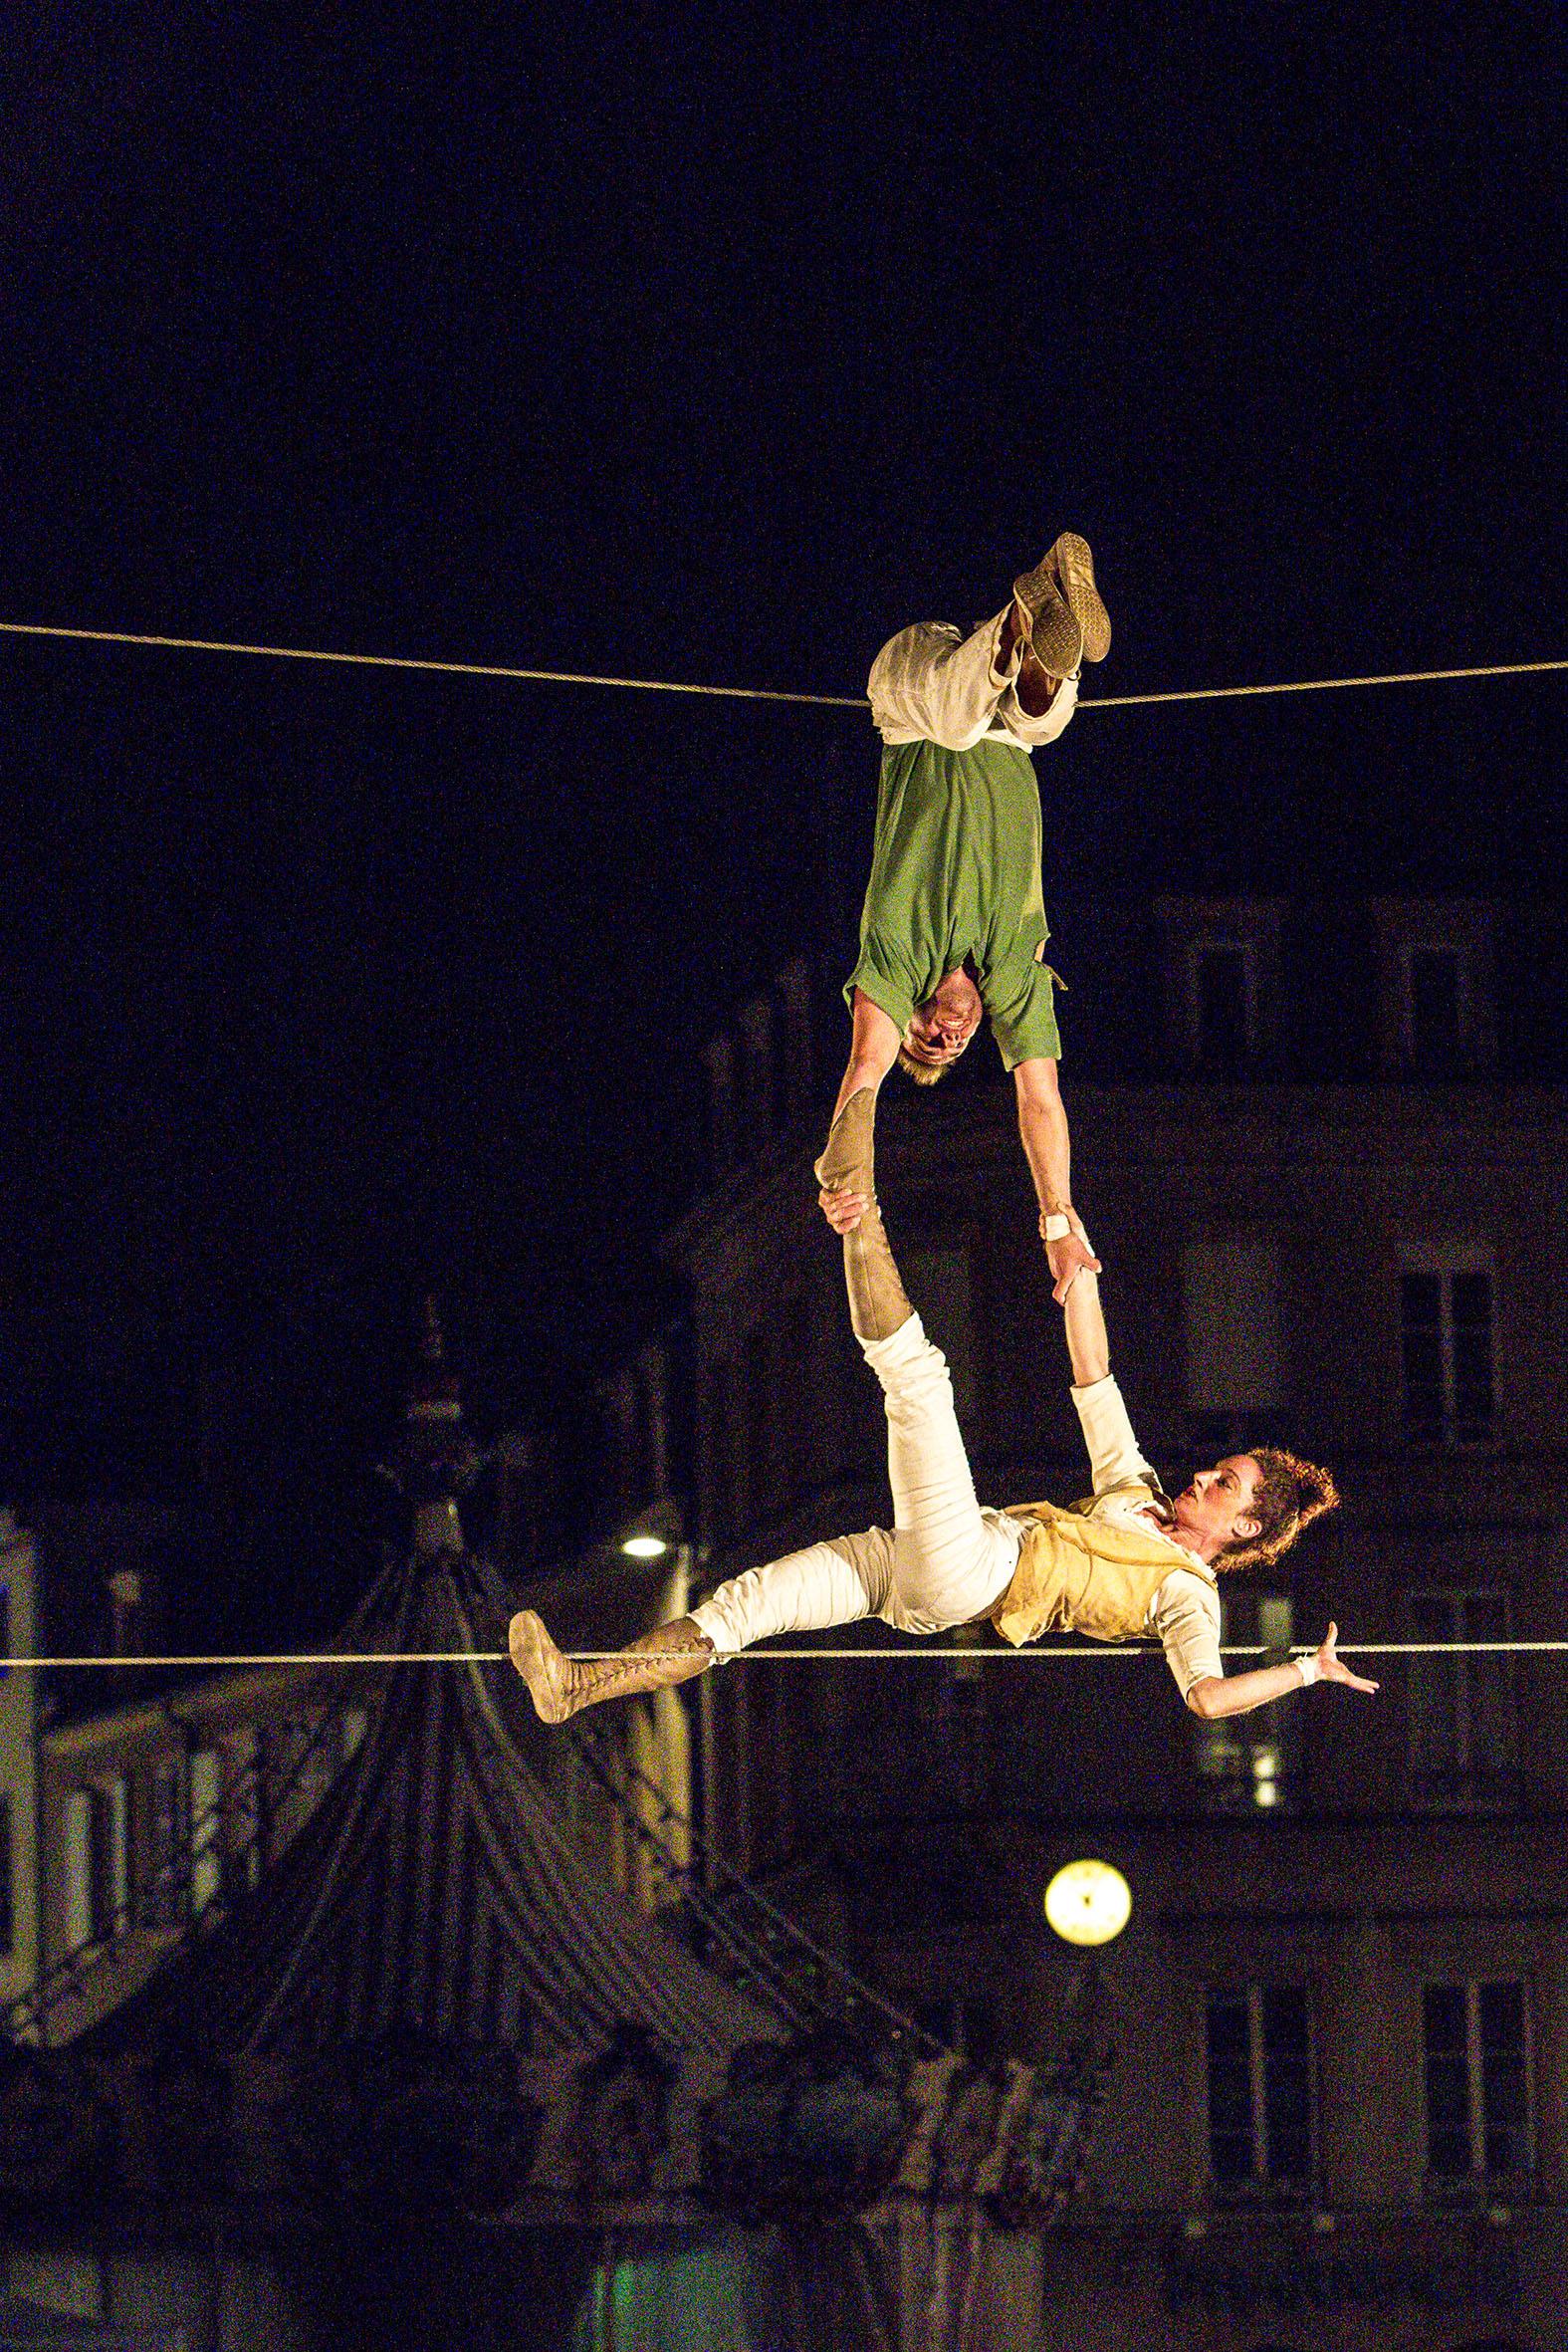 spectacles-sodade-cirque-rouage-mirabelle-metz-2015-marie-colette-becker-14